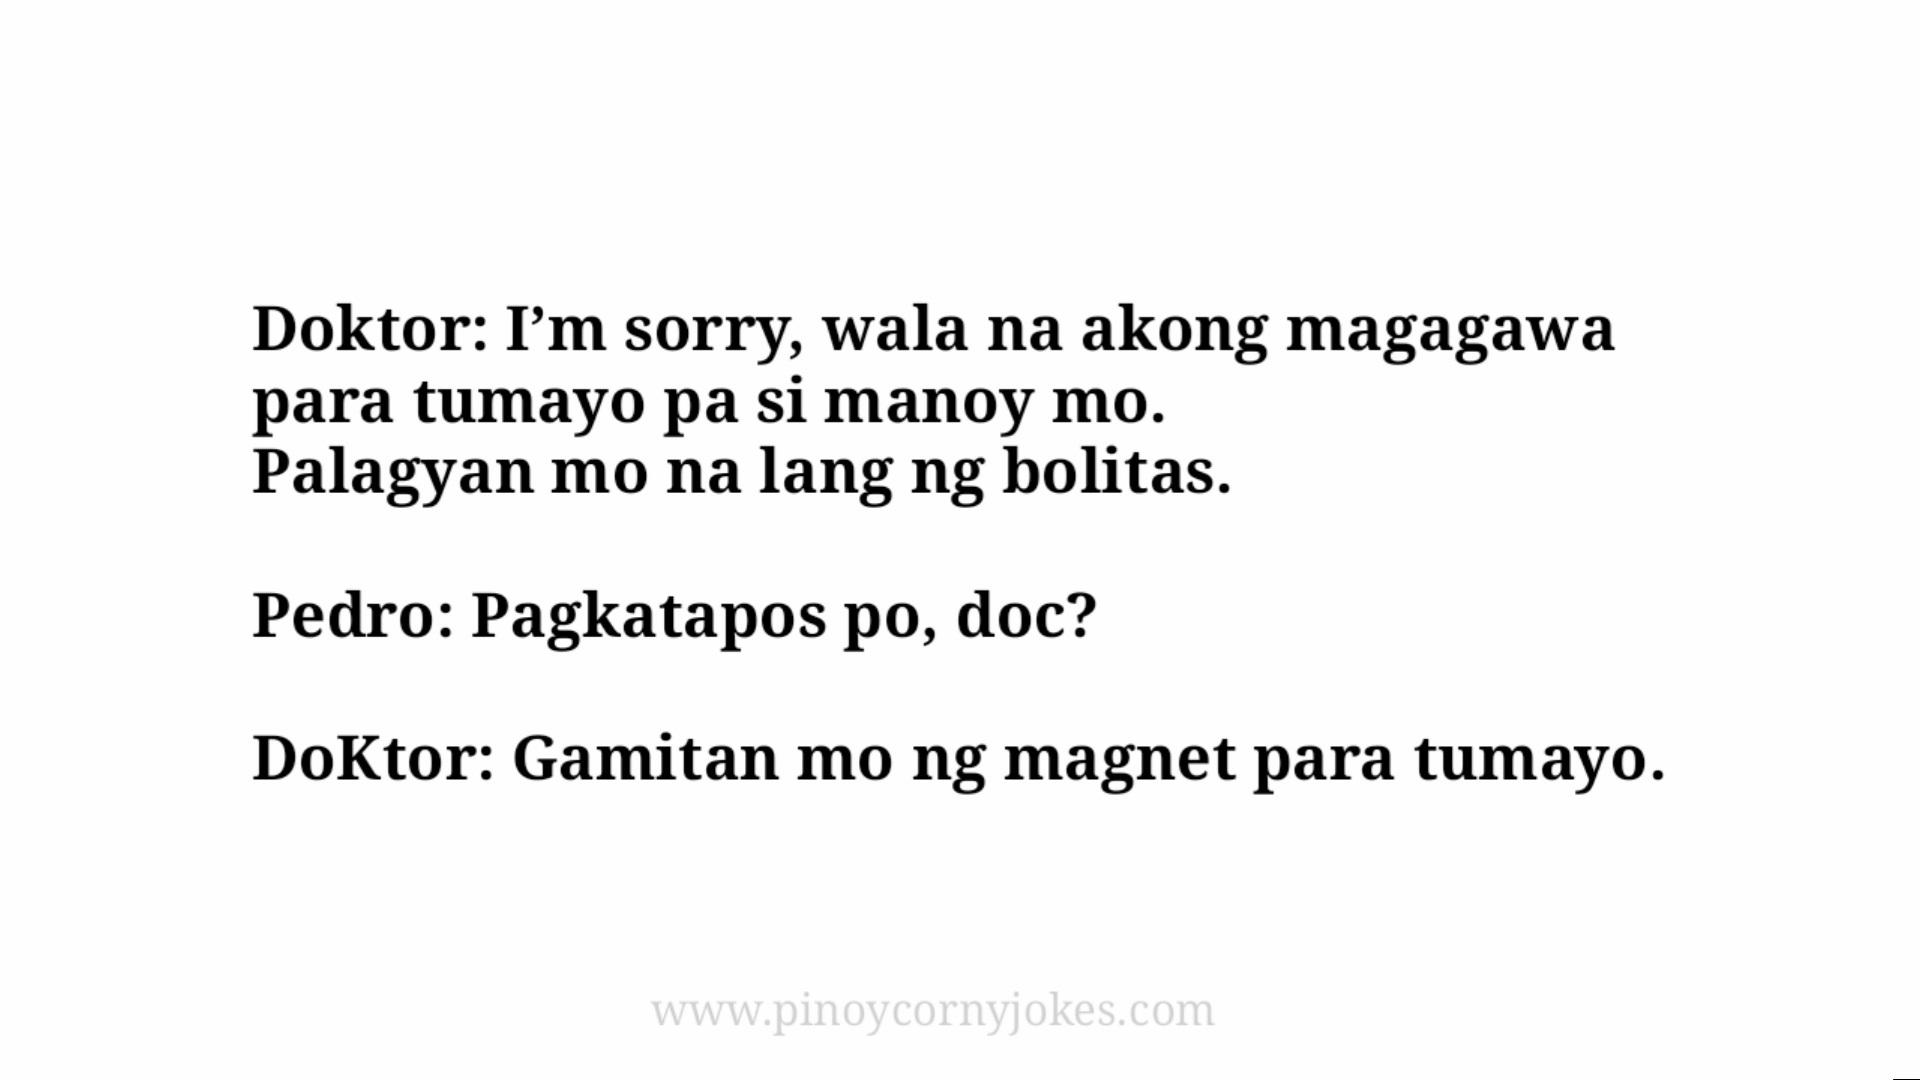 bolitas medical joke tagalog